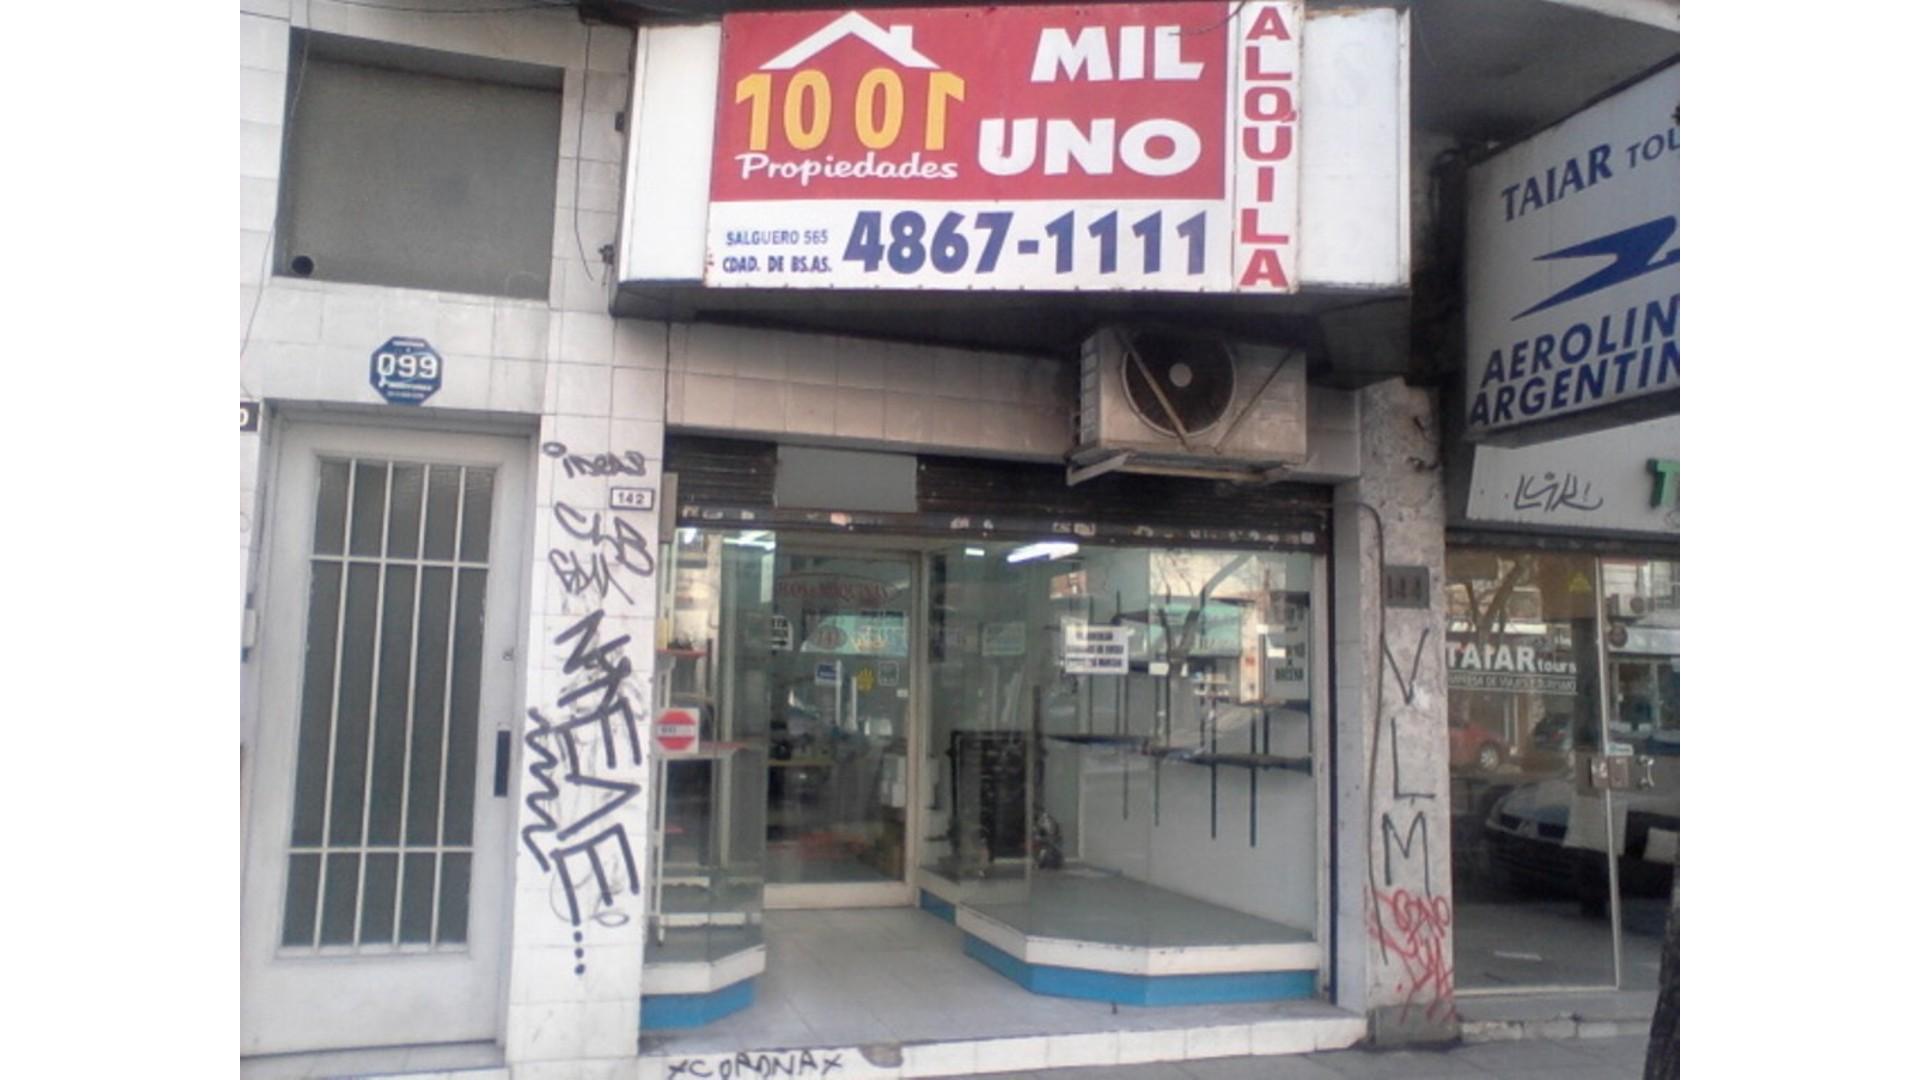 excelente local 110 m2 aprox. Sin expensas sobre Av. Scalabrini Ortiz al 100